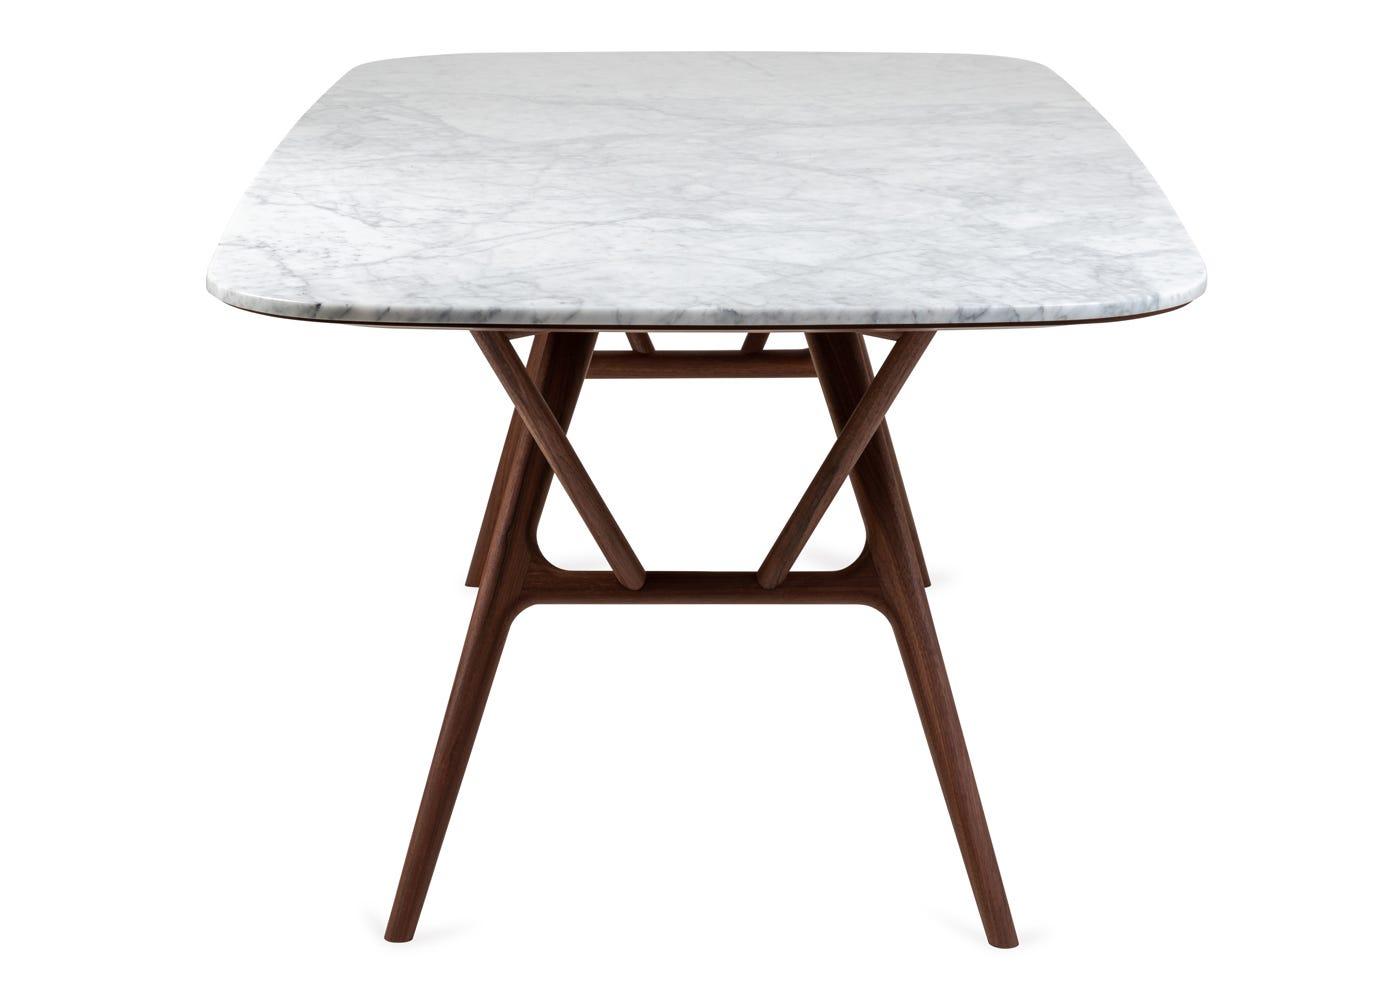 Anais Dining Table.